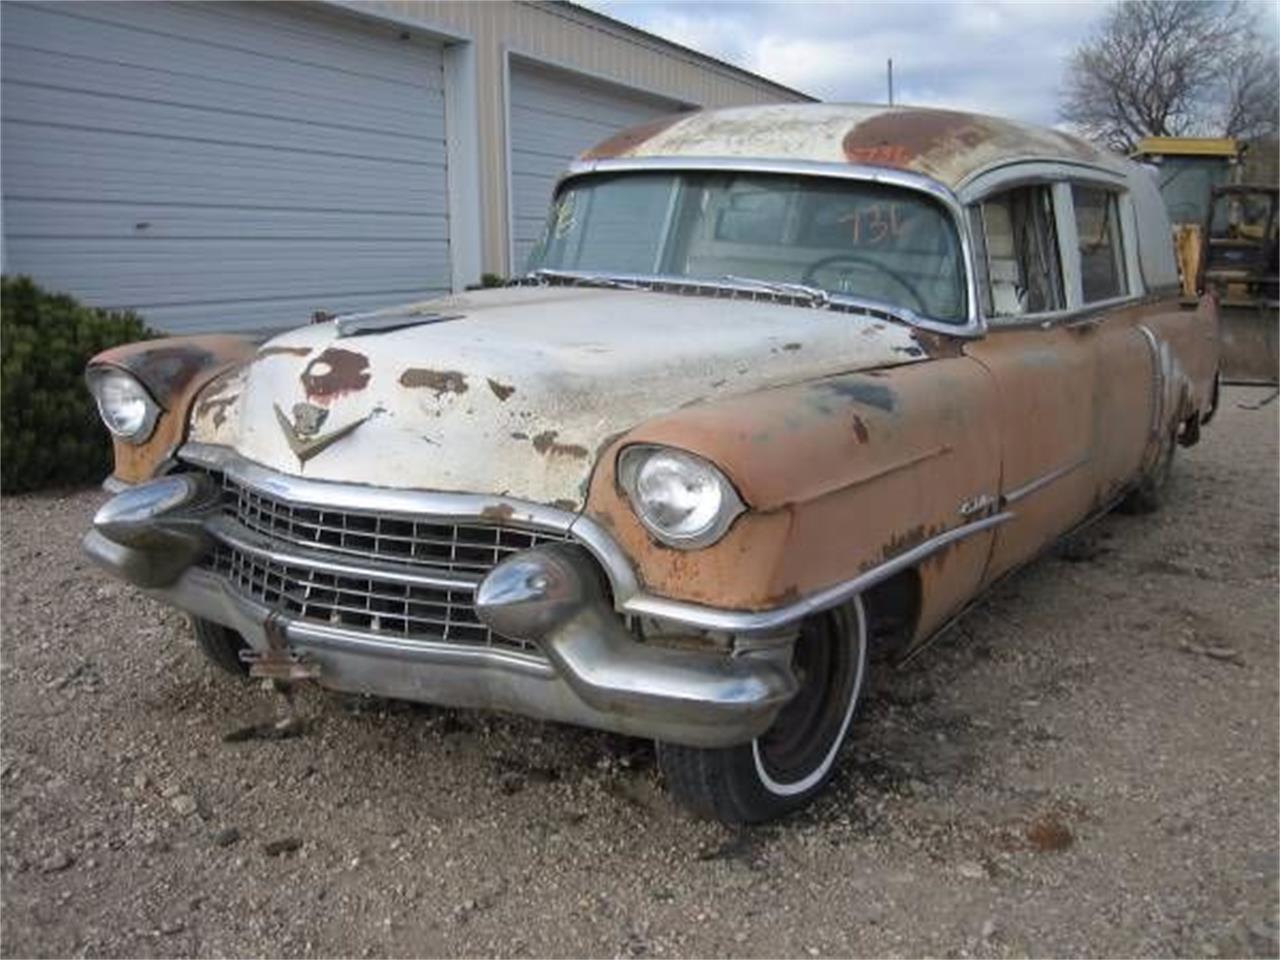 Ambulance For Sale >> 1955 Cadillac Ambulance For Sale Classiccars Com Cc 1121509